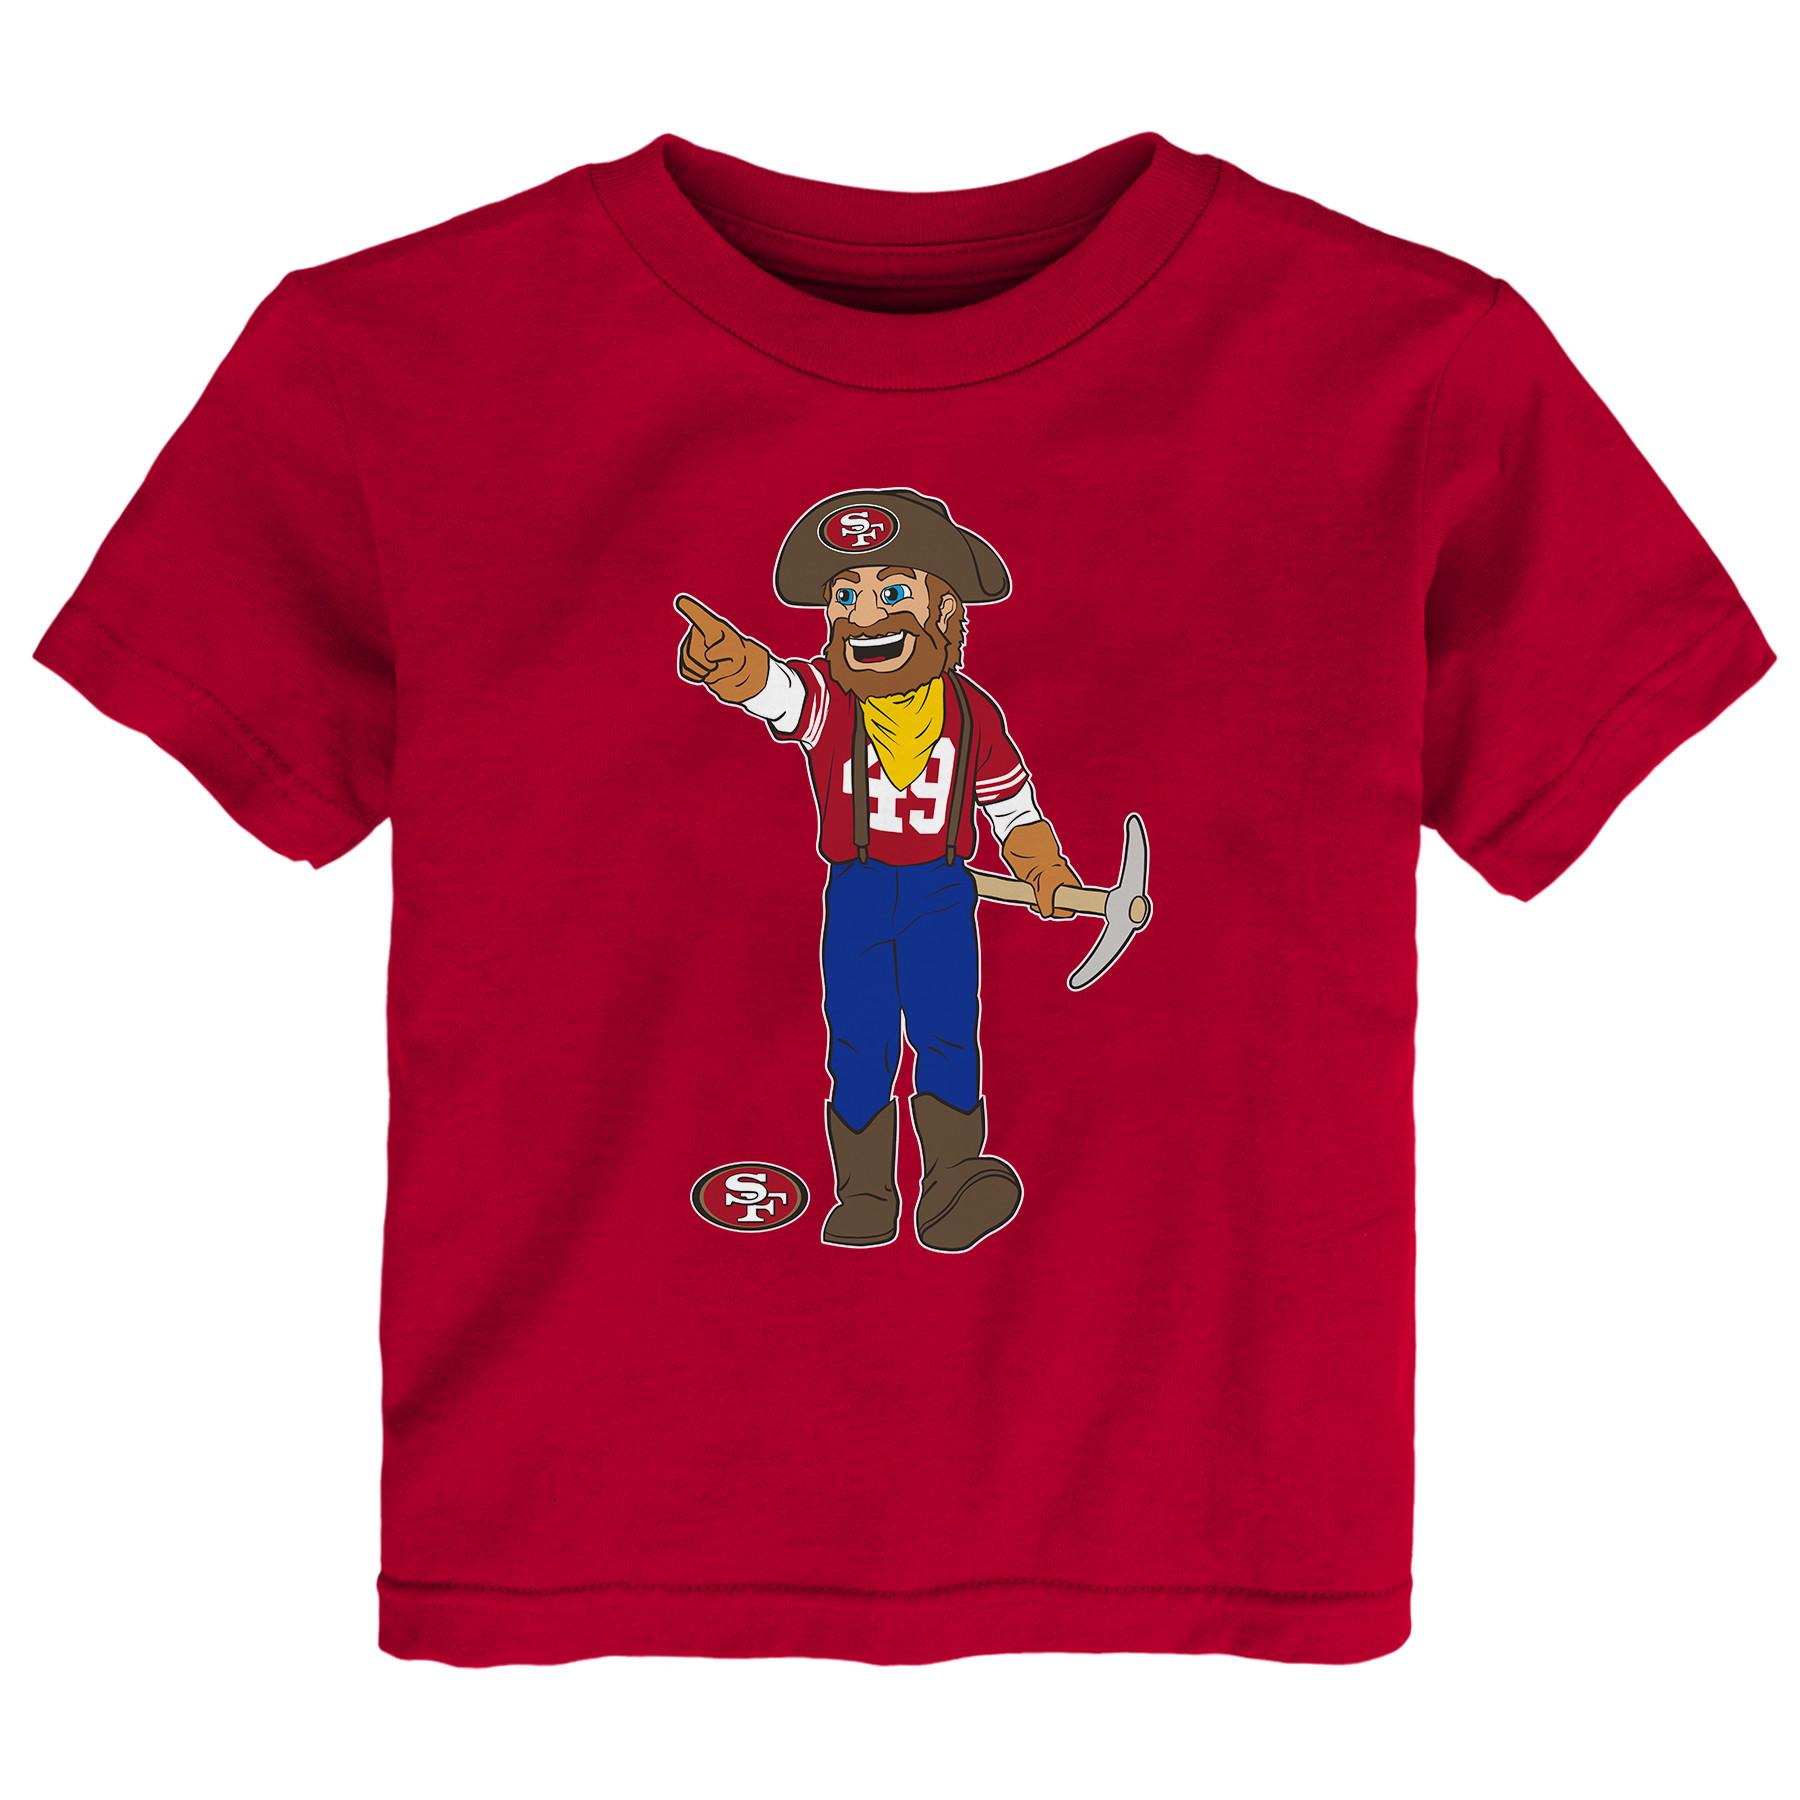 San Francisco 49ers Toddler Standing Team Mascot T-Shirt - Scarlet